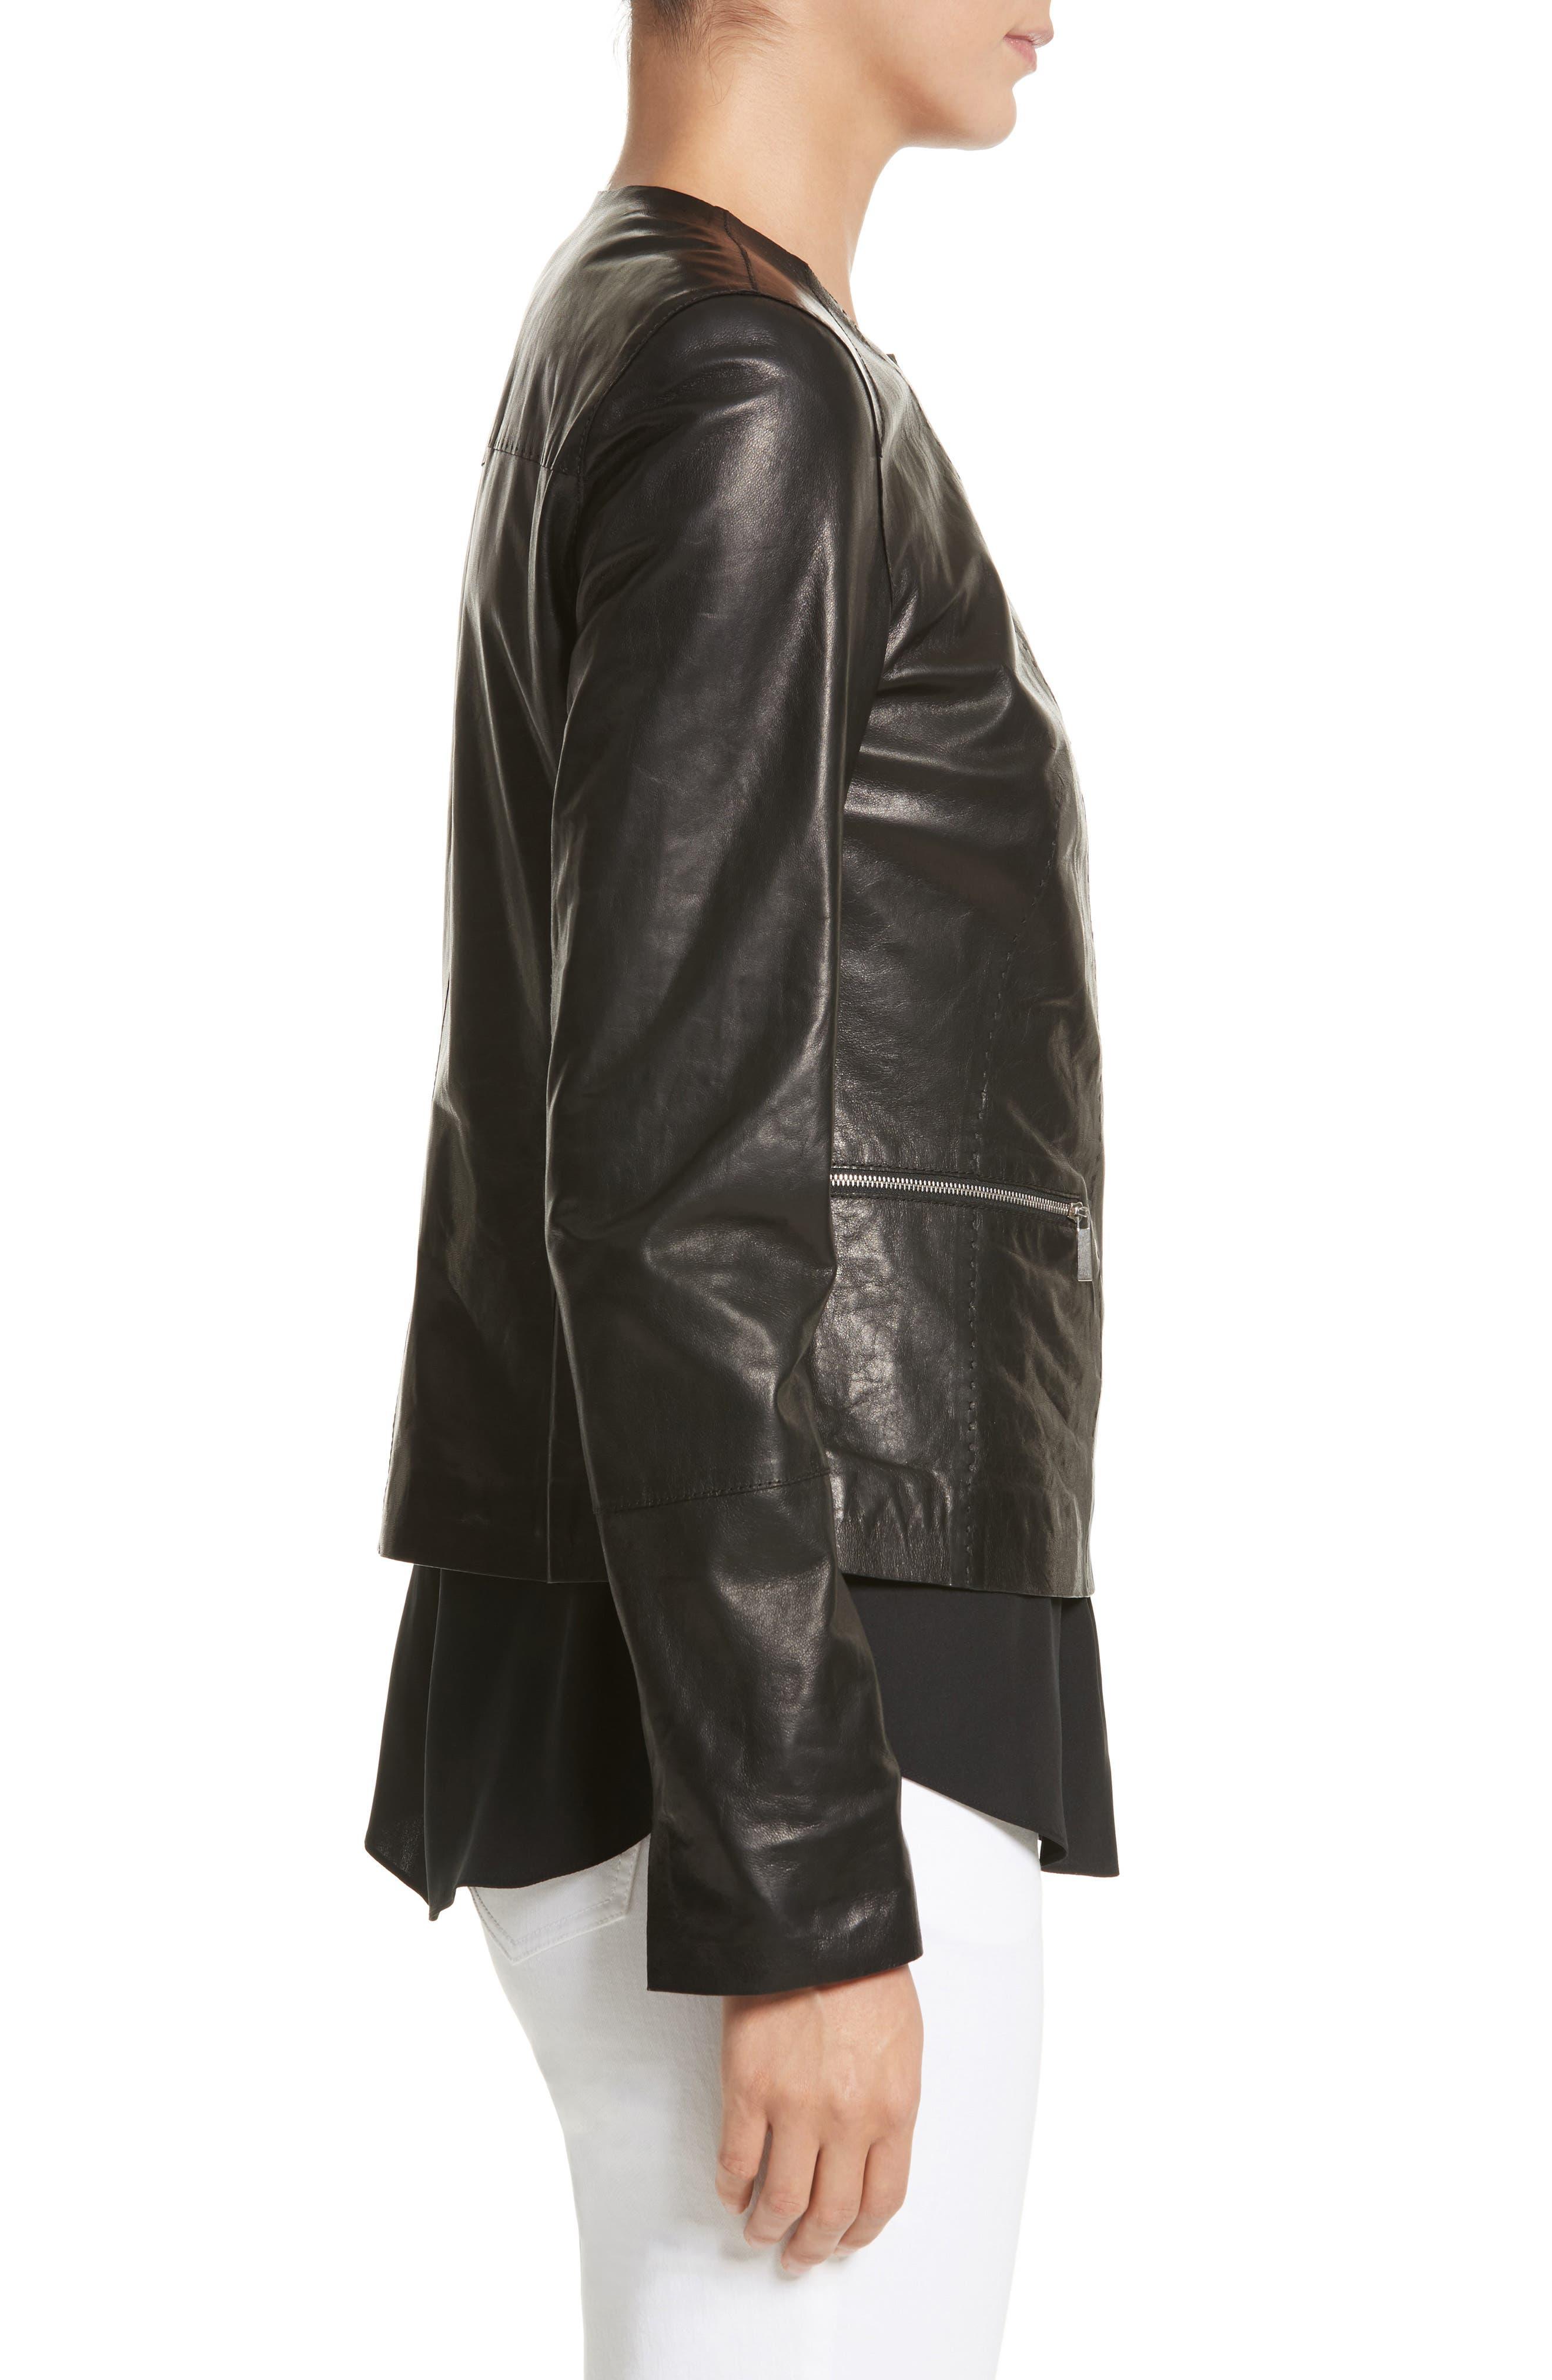 Caridee Glazed Lambskin Leather Jacket,                             Alternate thumbnail 3, color,                             001